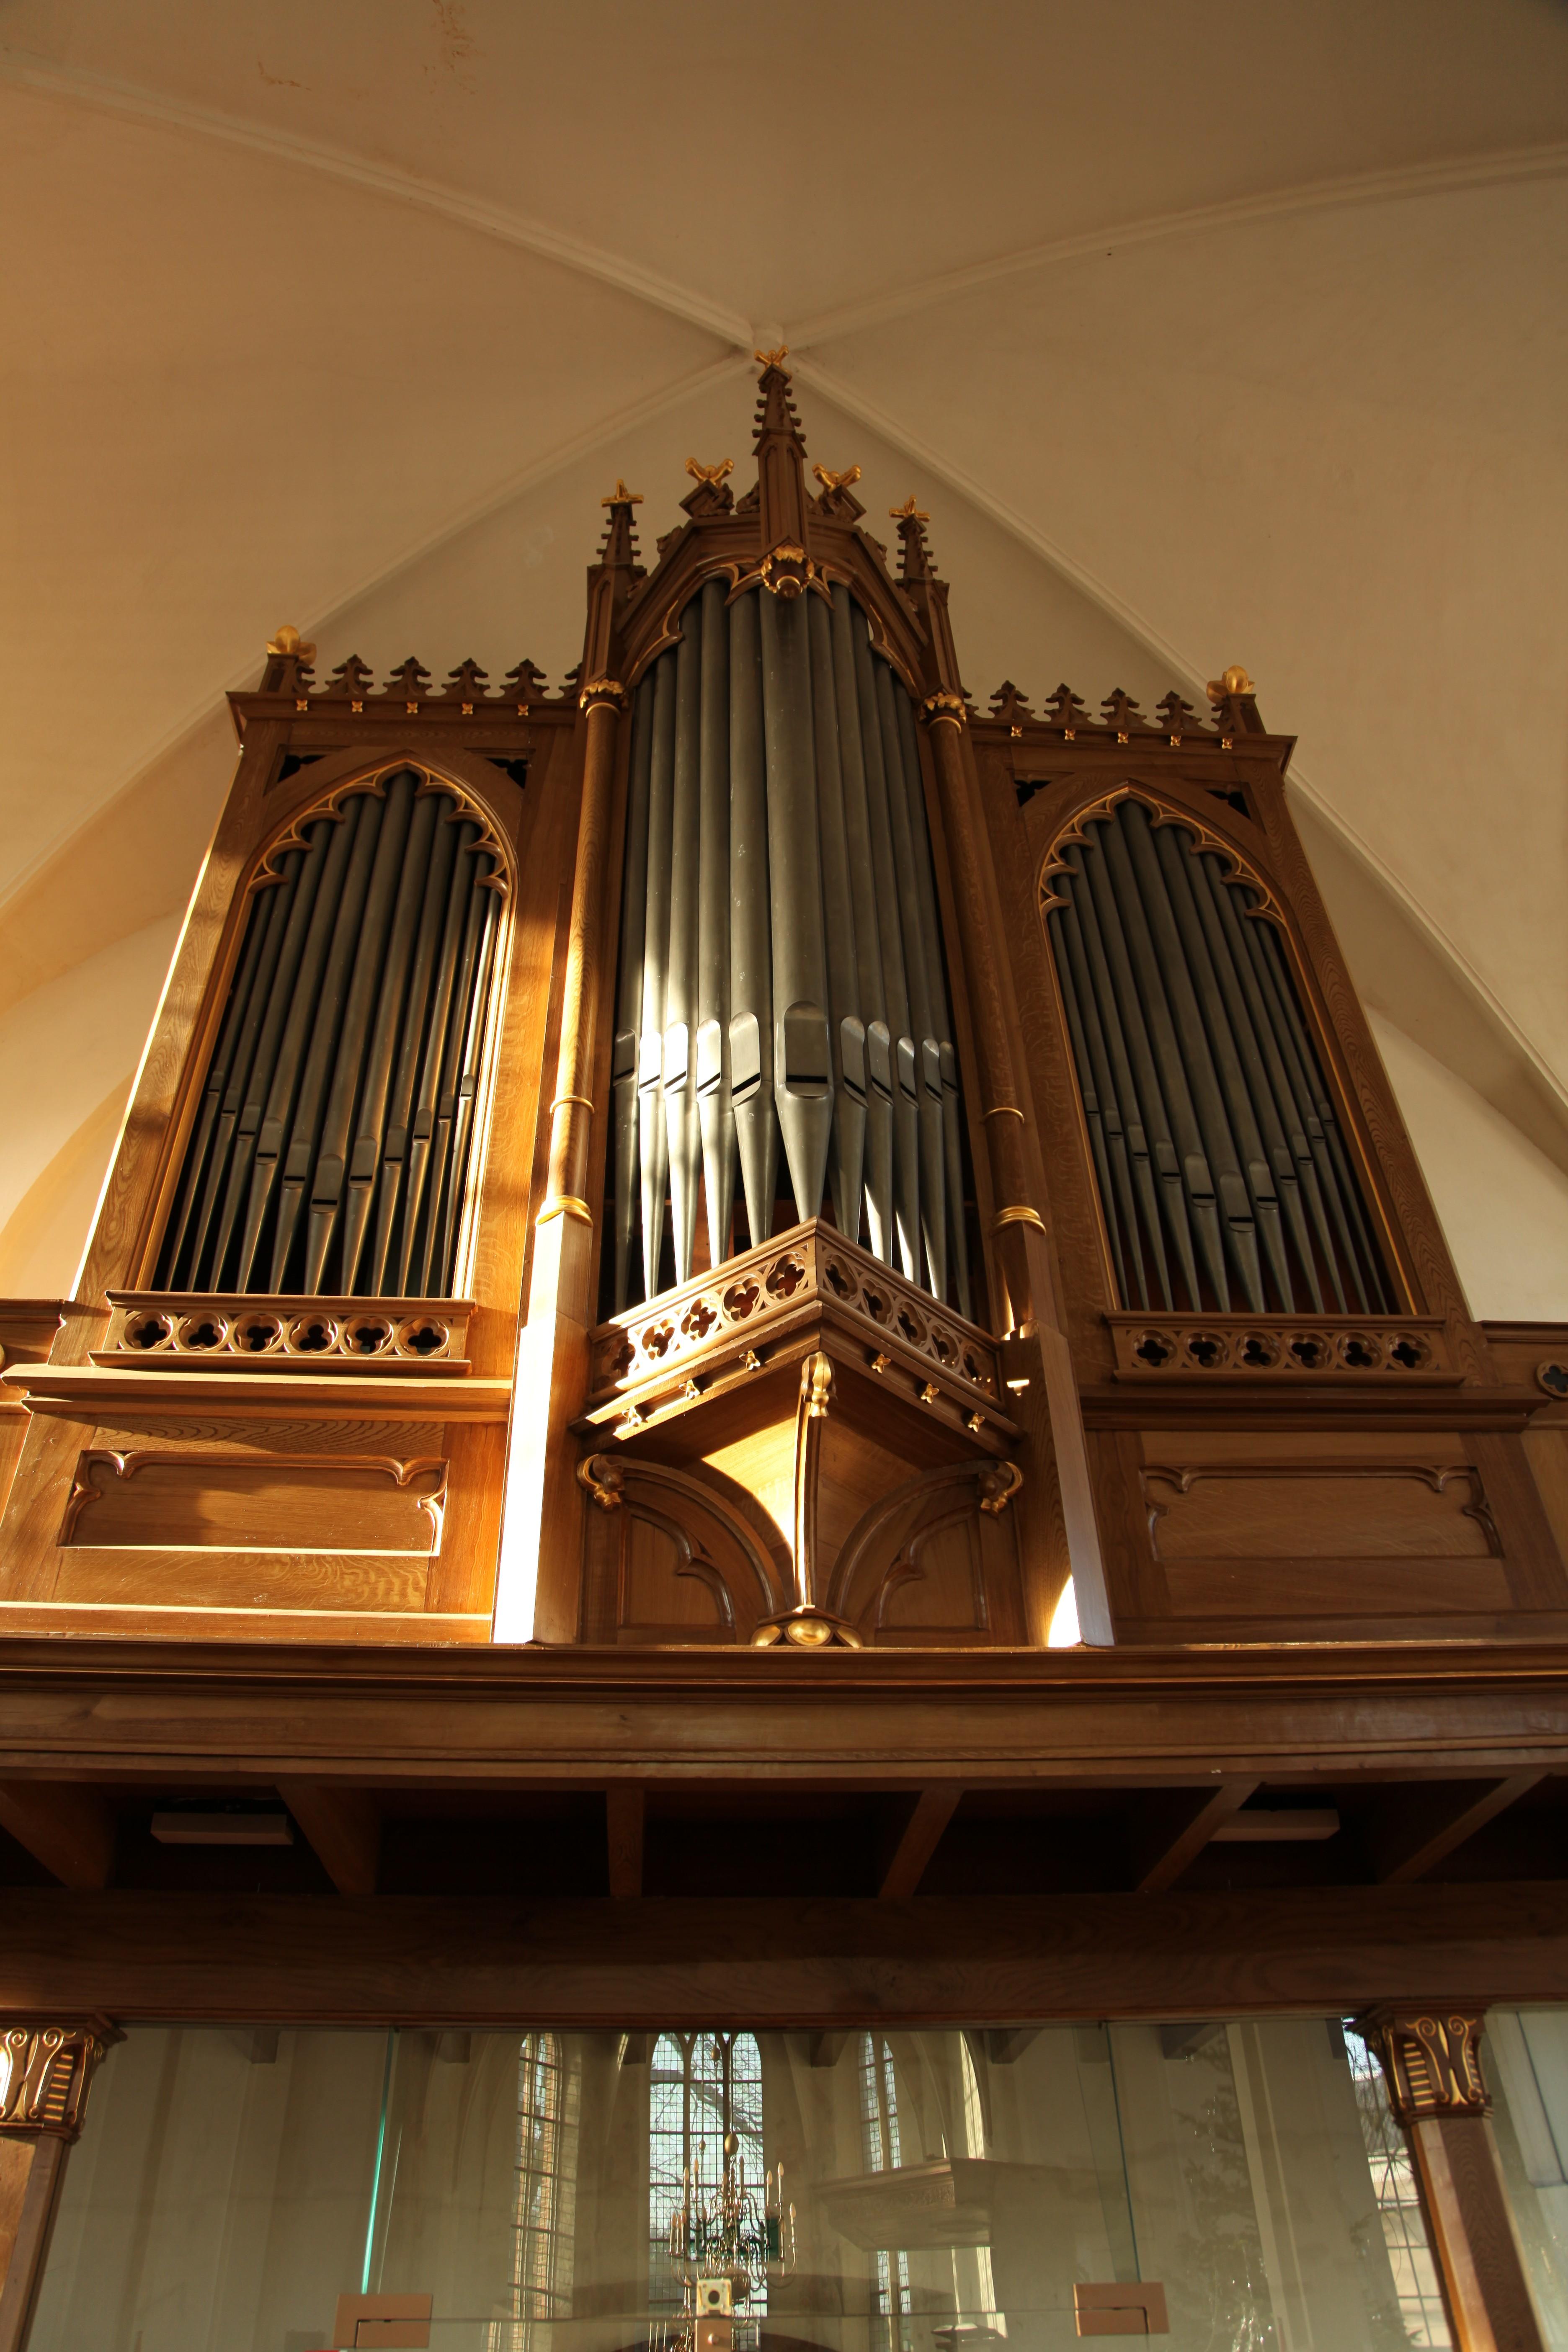 Het Hermannus Gerhardus Holtgräve-orgel uit 1876 in de Dorpskerk in Bathmen